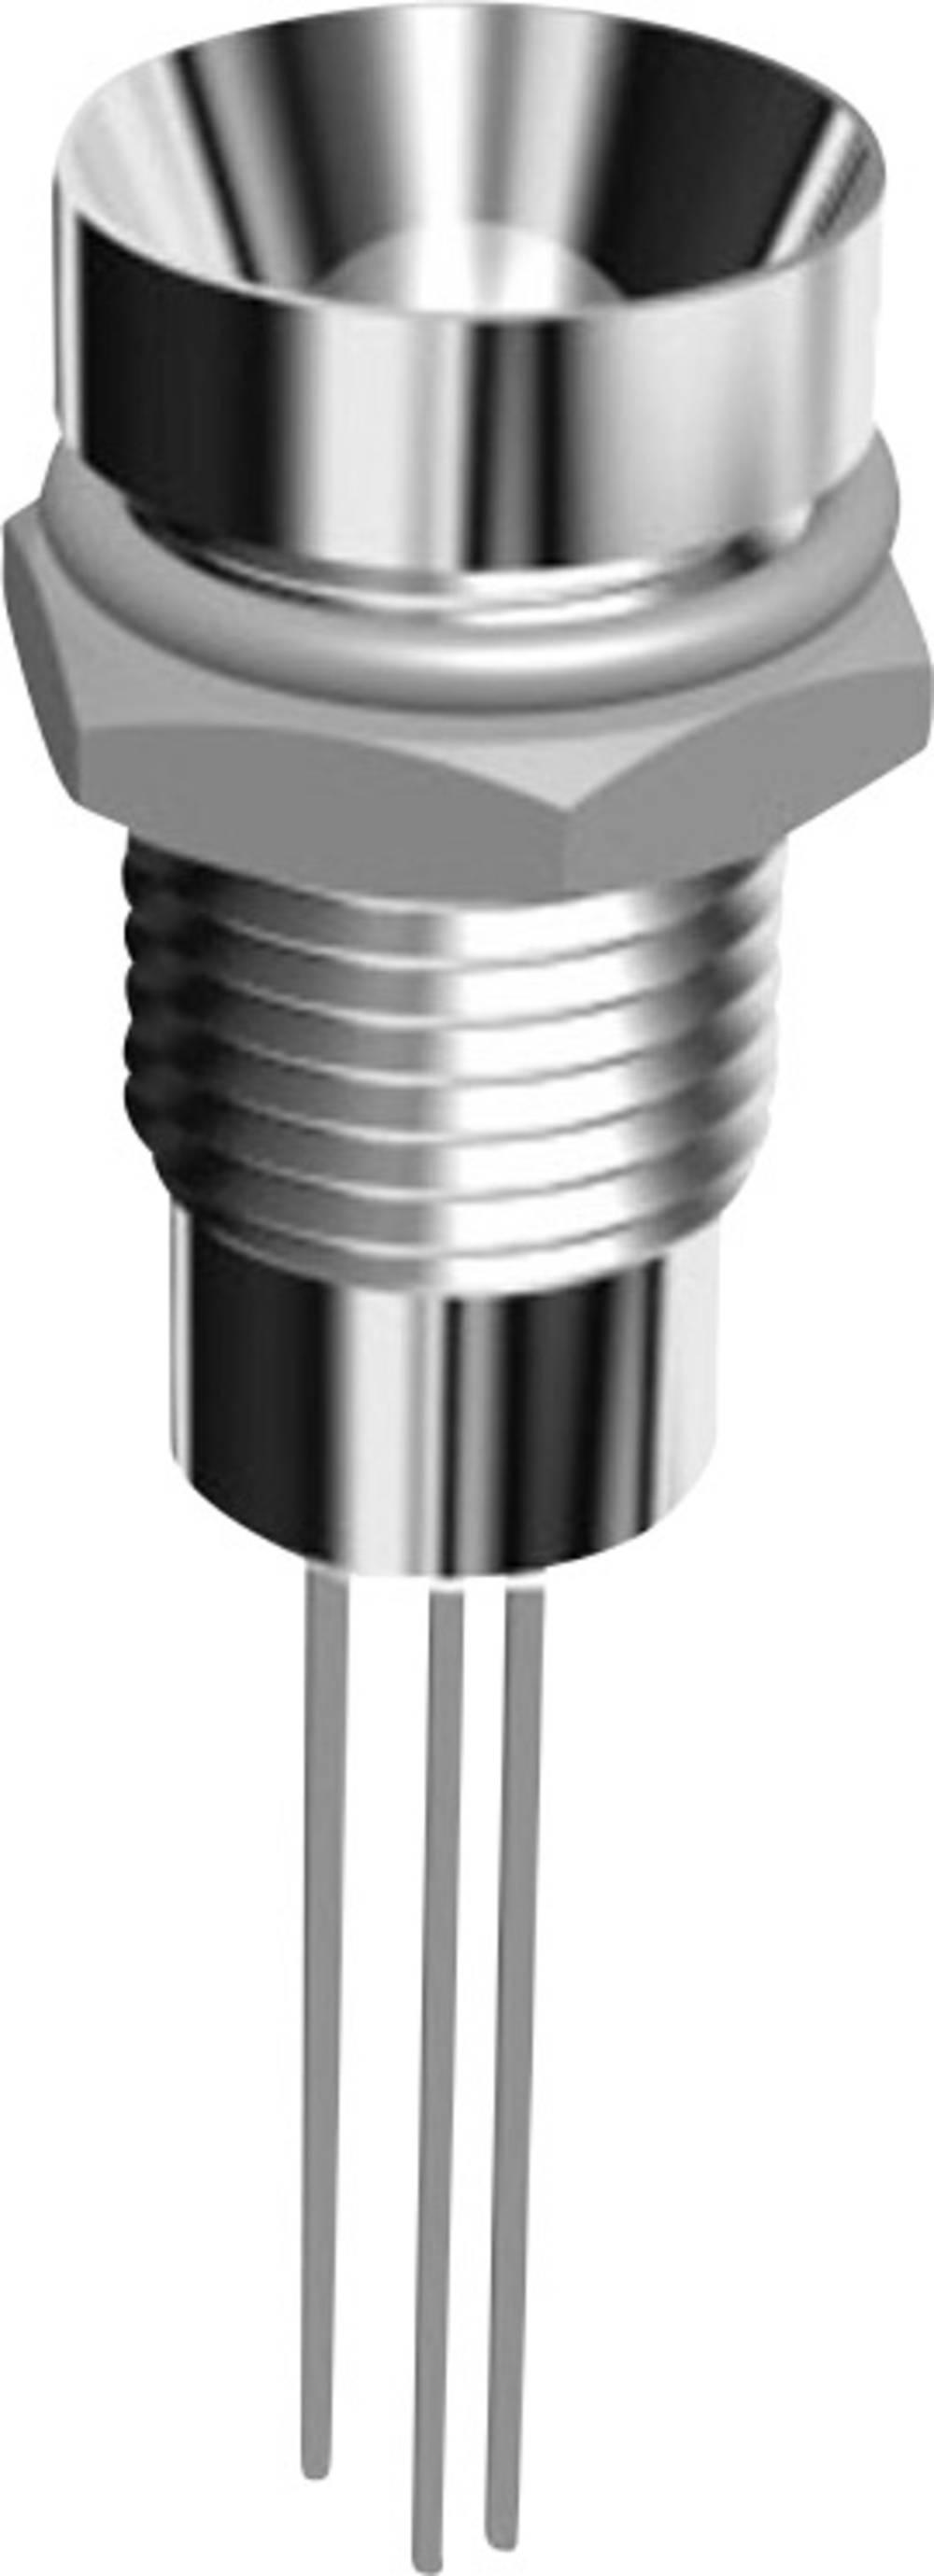 LED signalna lučka, večbarvna, rdeča, zelena 1.8 V, 2.2 V 30 mA Signal Construct SEMZ 082 RT/GR